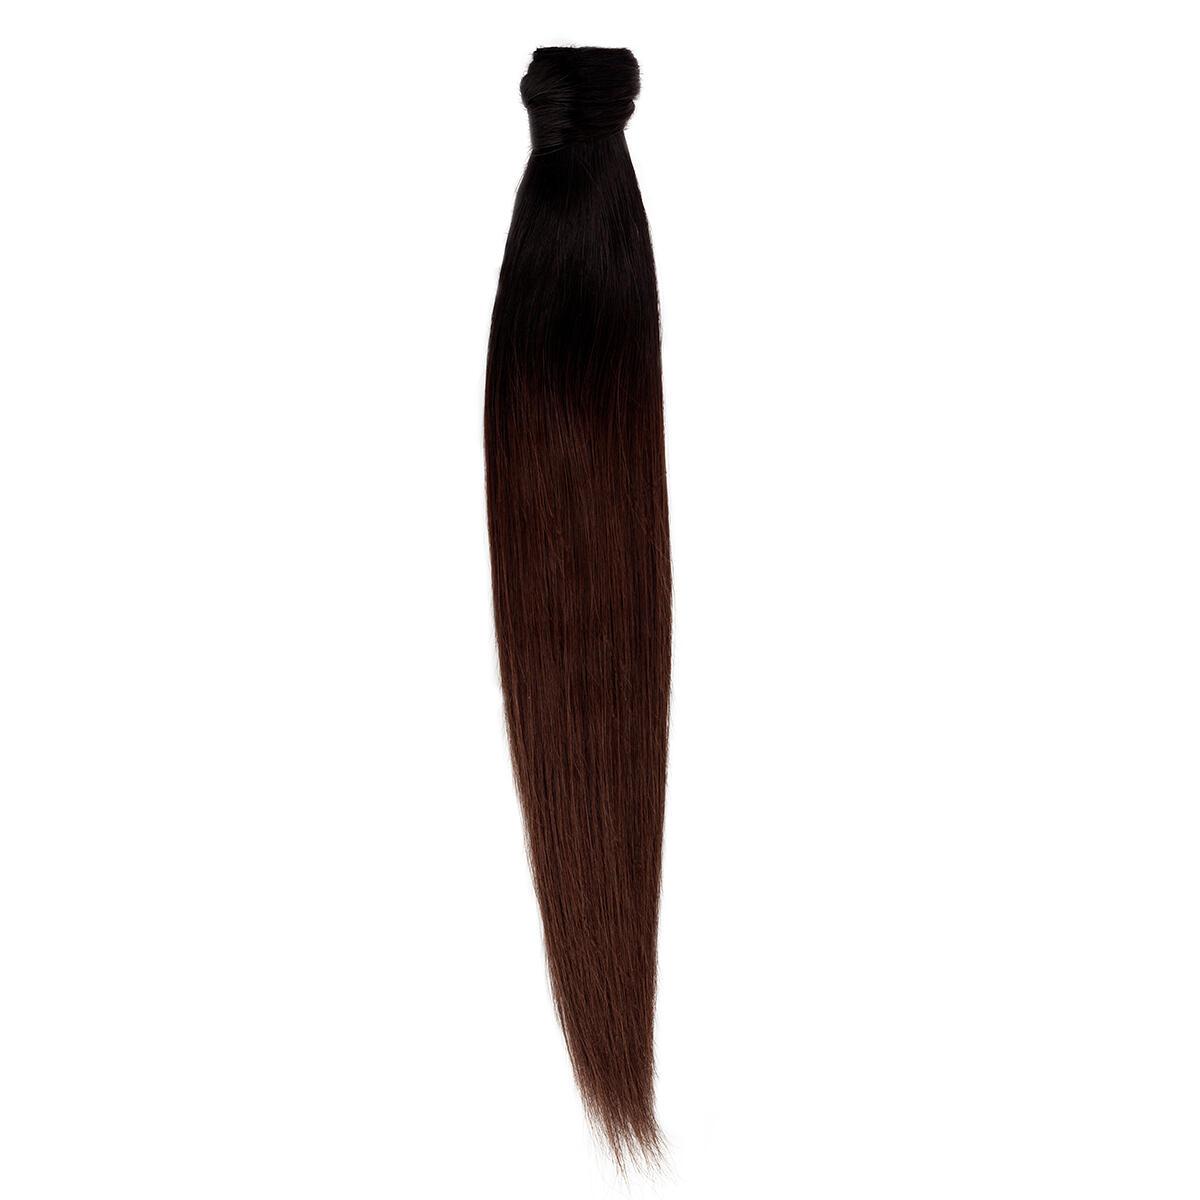 Clip-in Ponytail Original O1.2/2.0 Black Brown Ombre 40 cm